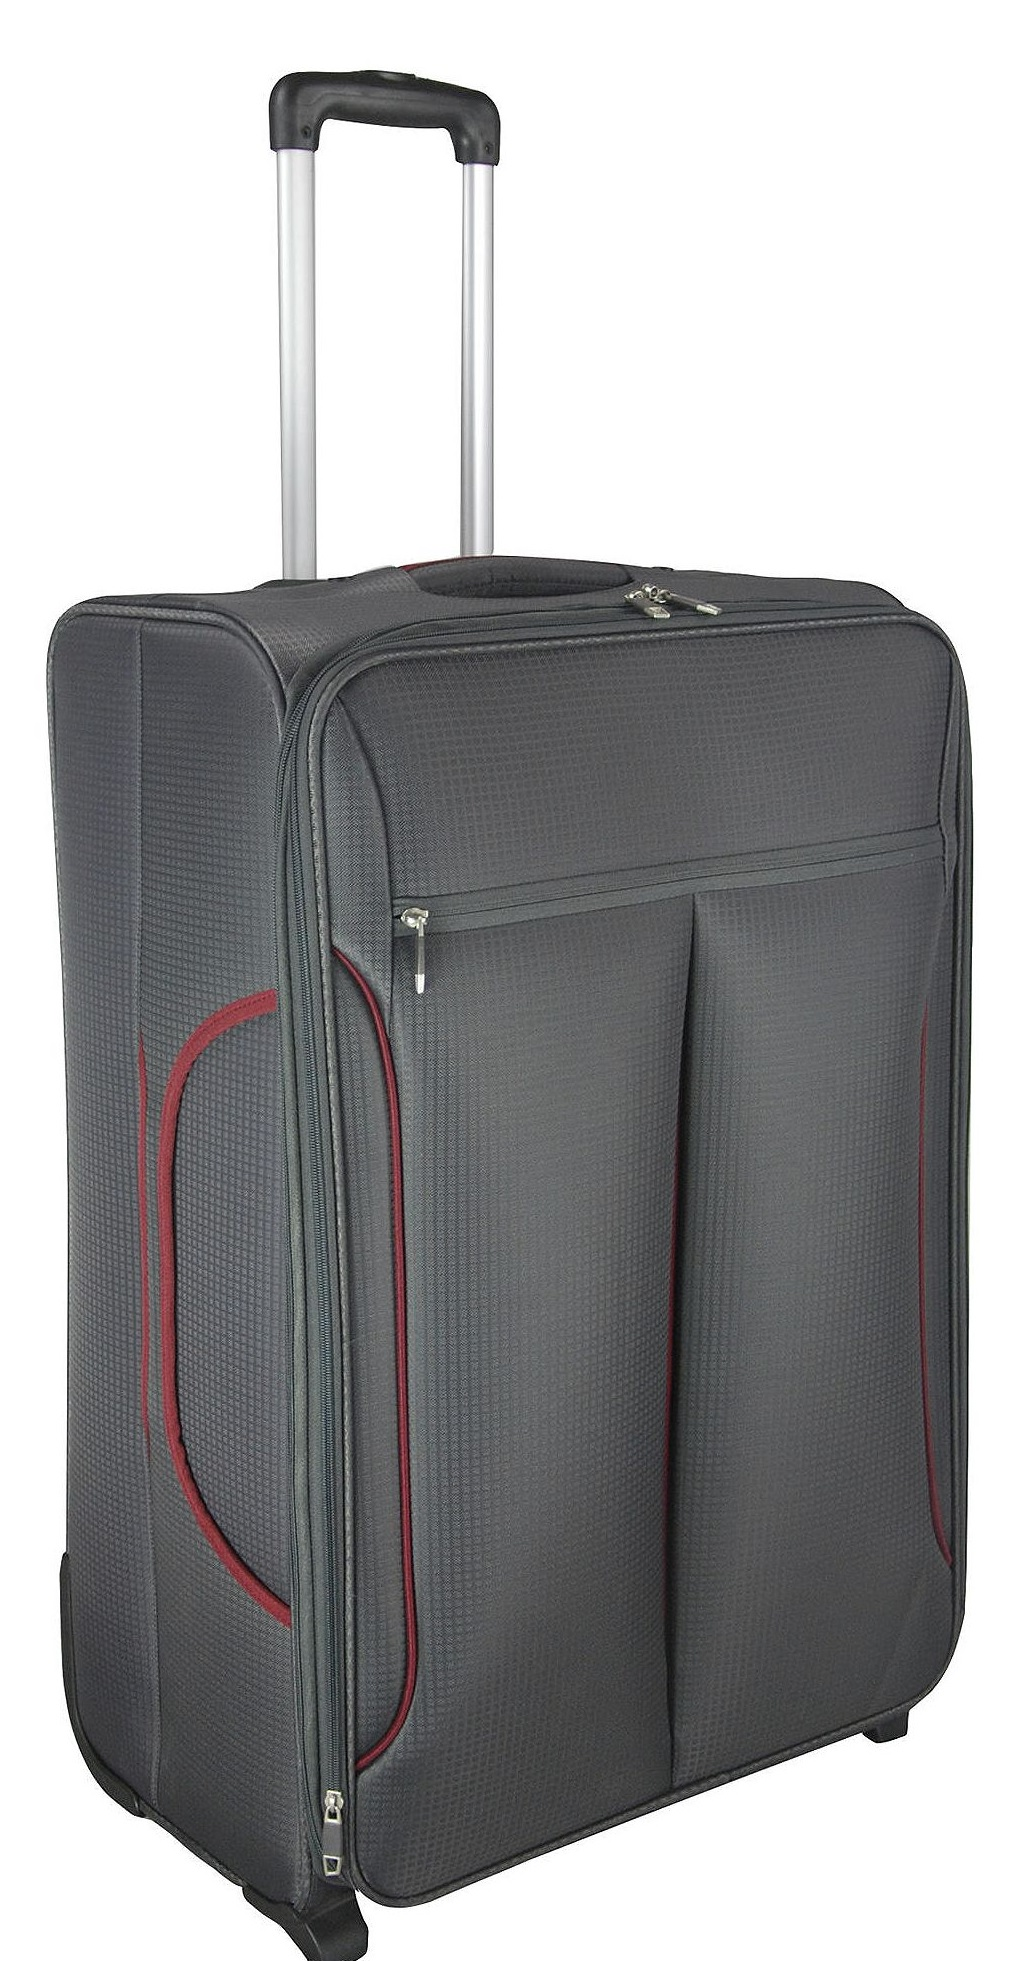 new tesco rio lightweight 2 wheel large suitcase grey. Black Bedroom Furniture Sets. Home Design Ideas